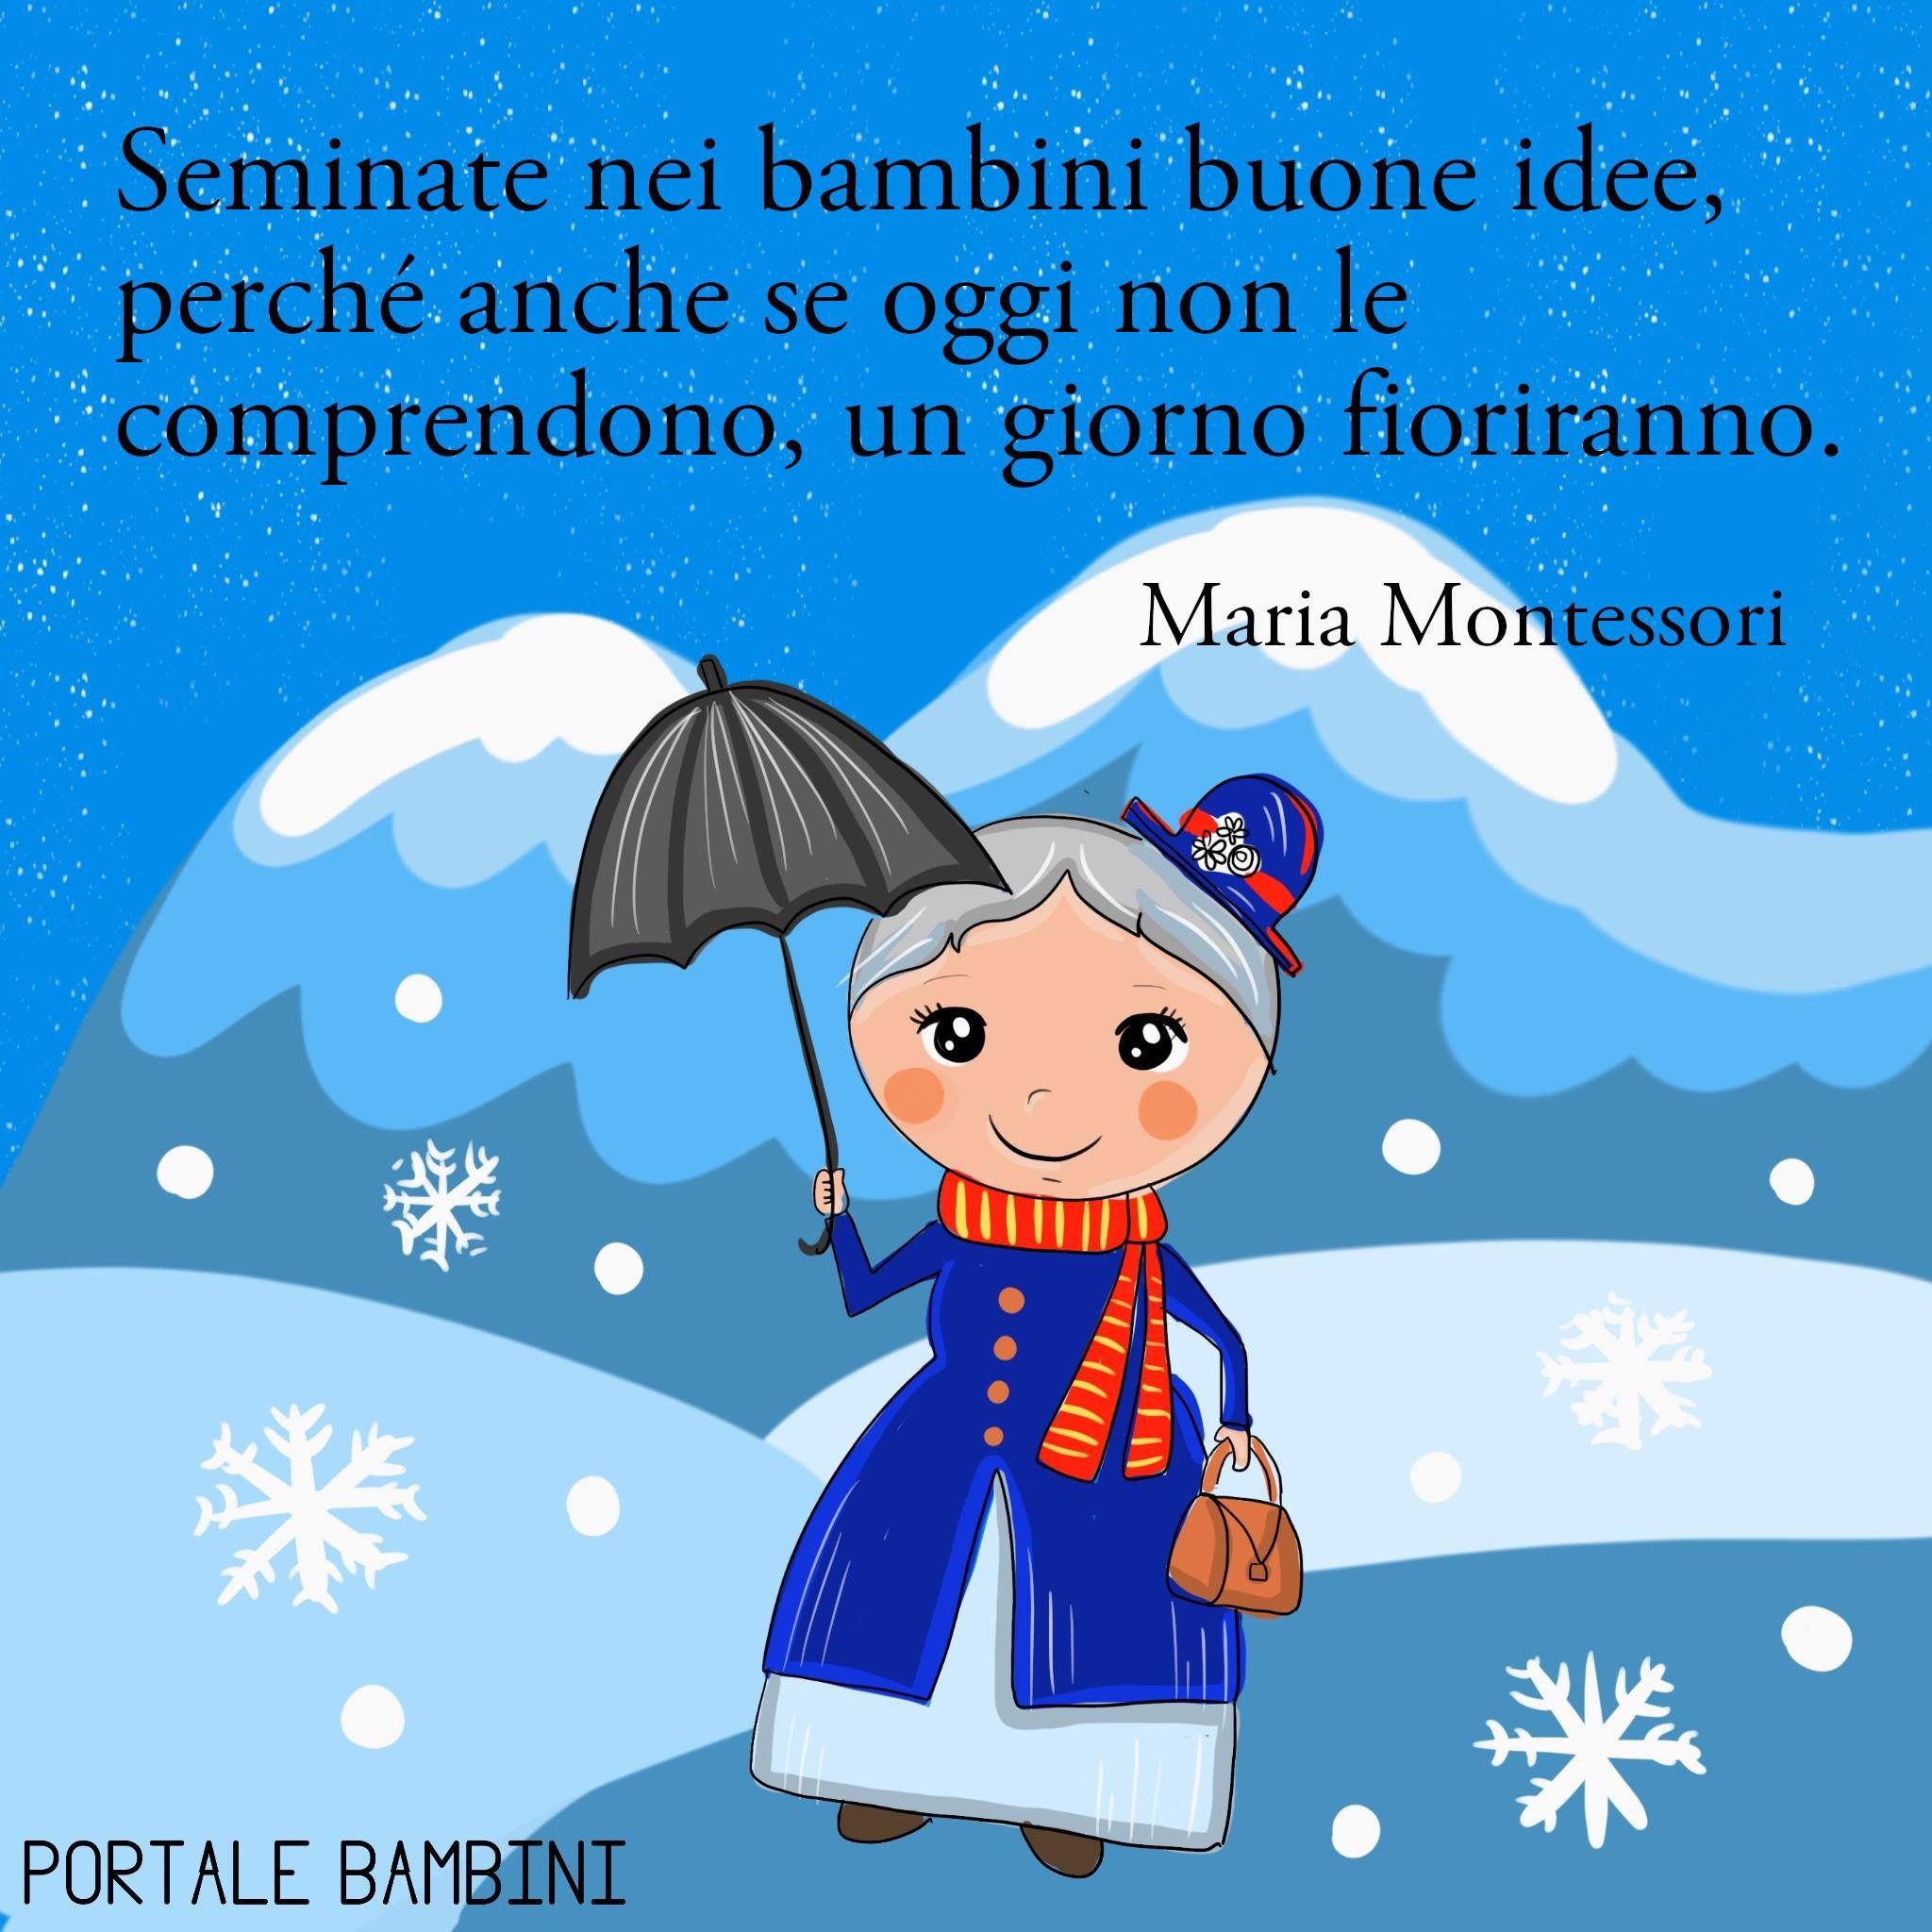 Le Frasi Piu Belle E Significative Di Maria Montessori Frasi Sui